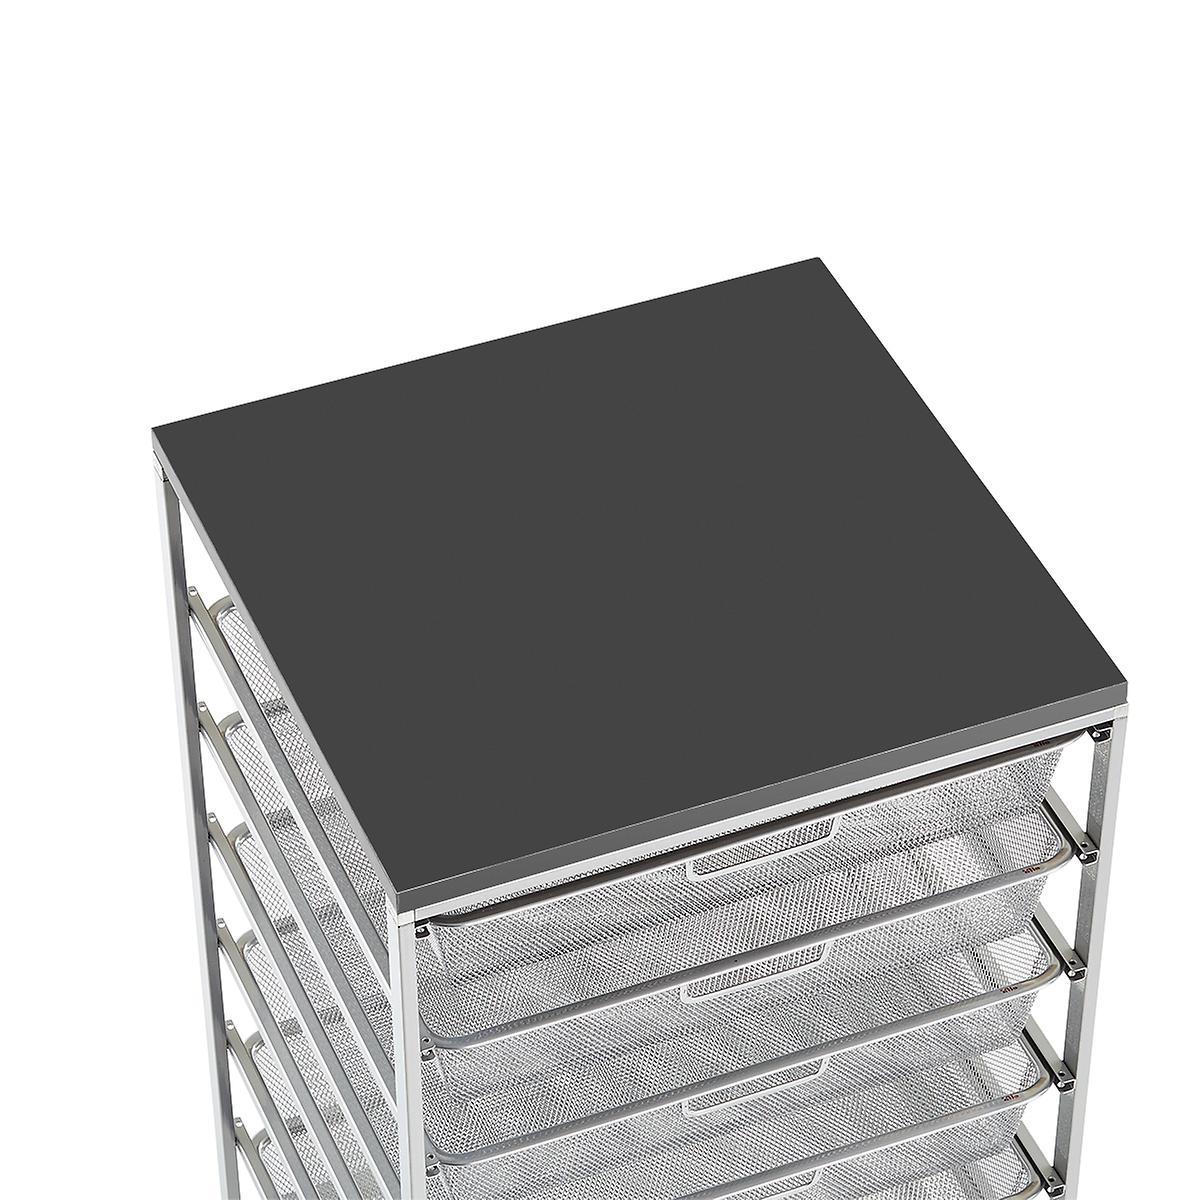 Slate Cabinet-Sized Elfa Melamine Top